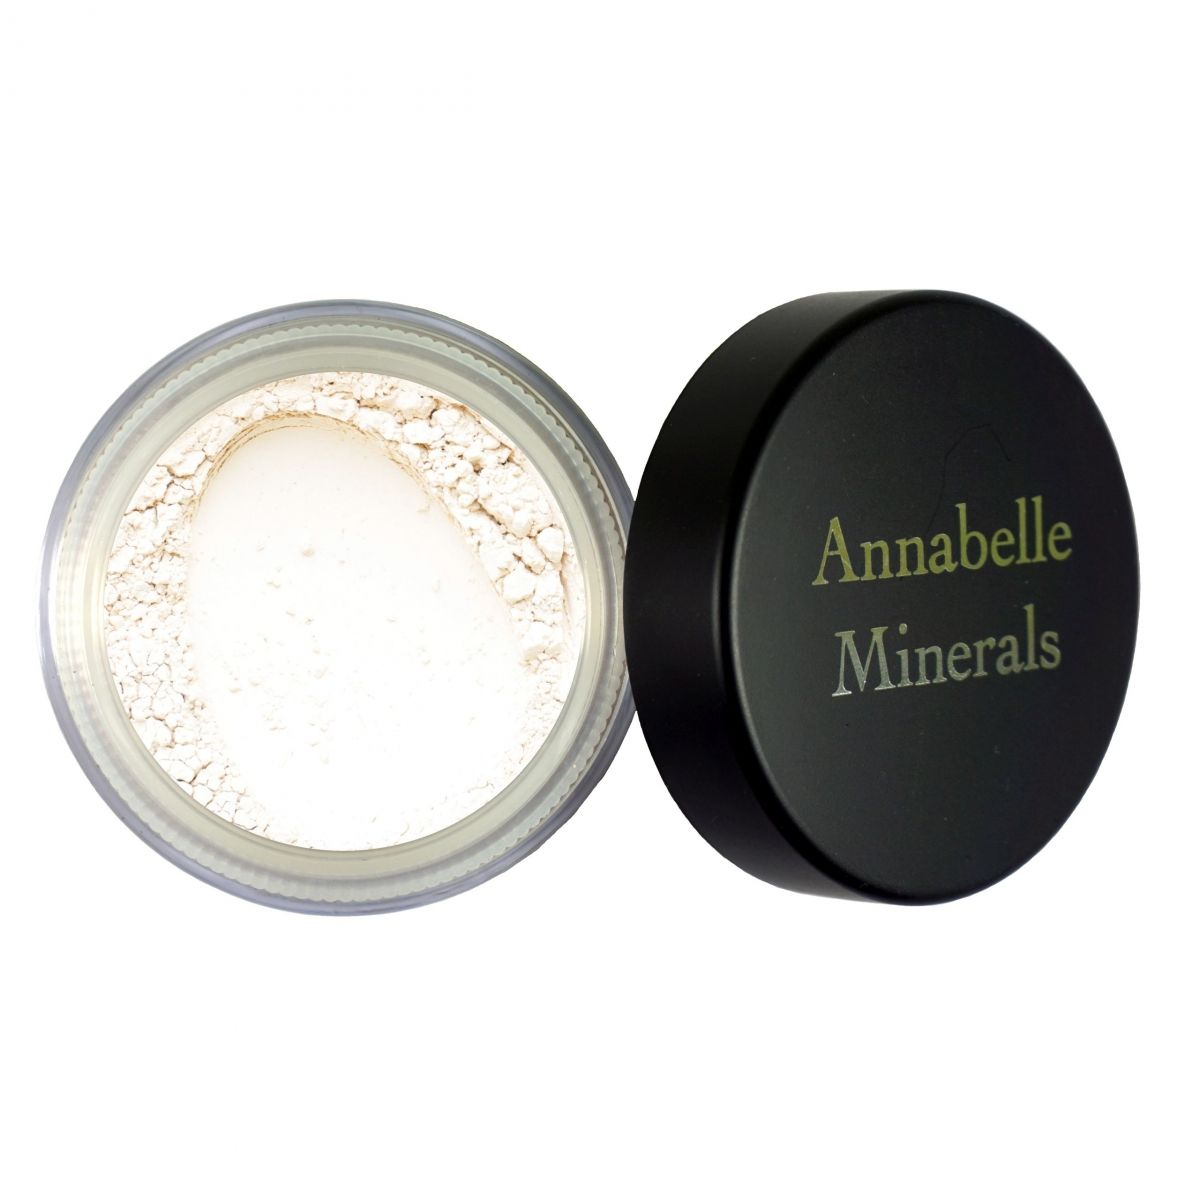 Podkład mineralny - rozświetlający Natural Cream - 10g - Annabelle Minerals